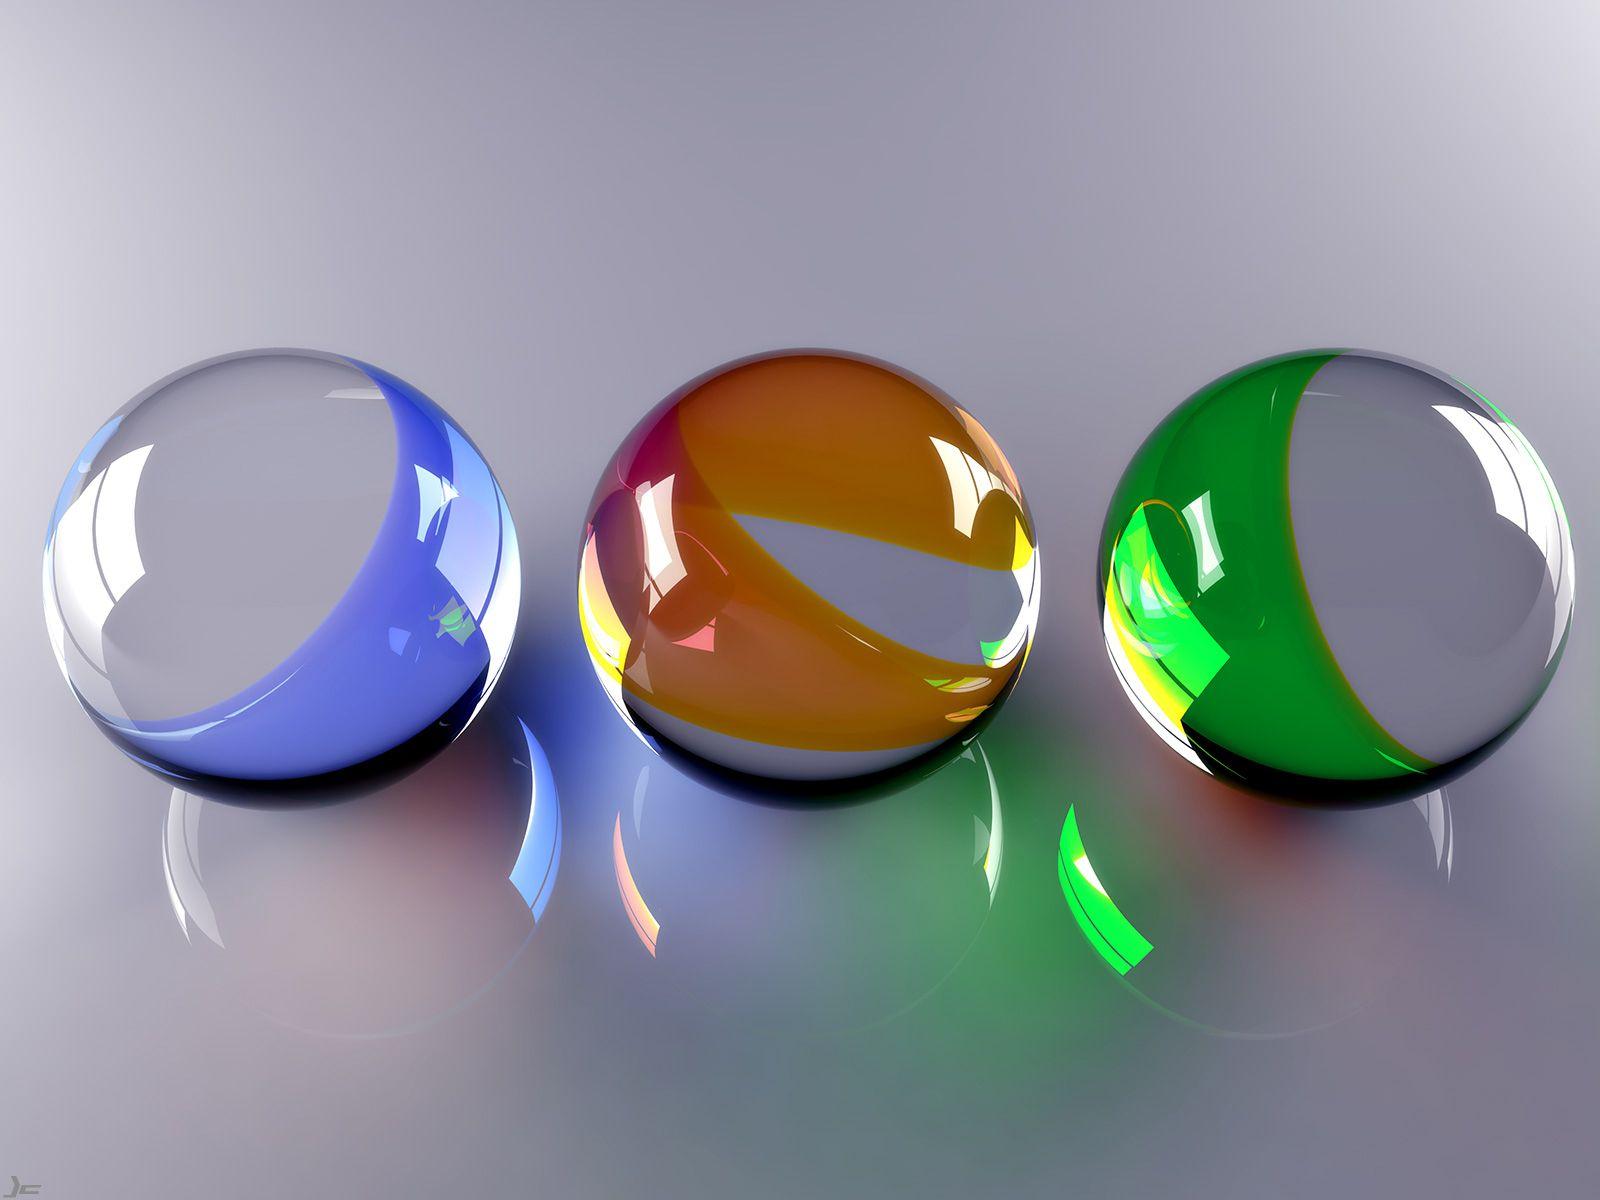 Decorative Marble Balls Renkli Gülleler  Beyaz  Pinterest  Marbles And Wallpaper